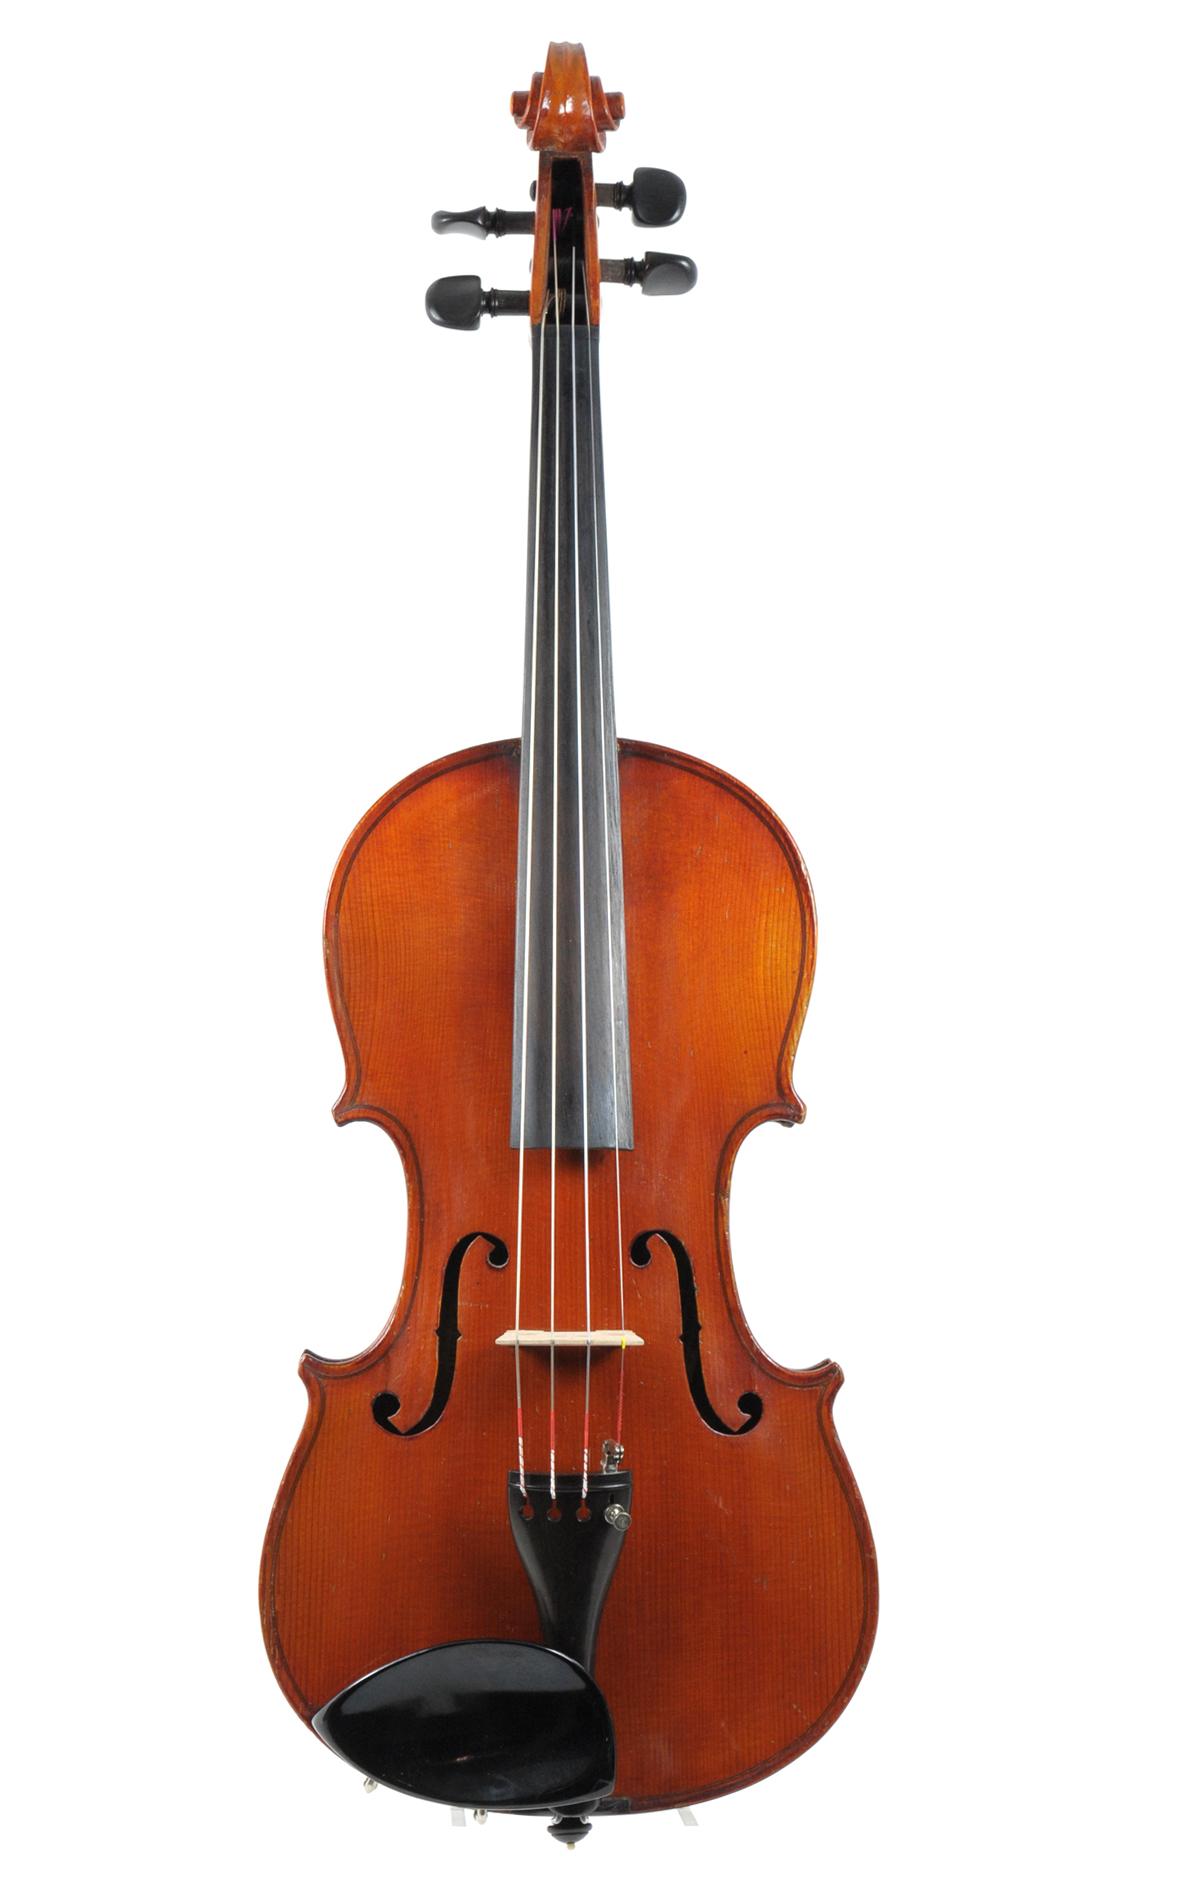 German-American Violin,labeled G. C. Urban,Cleveland